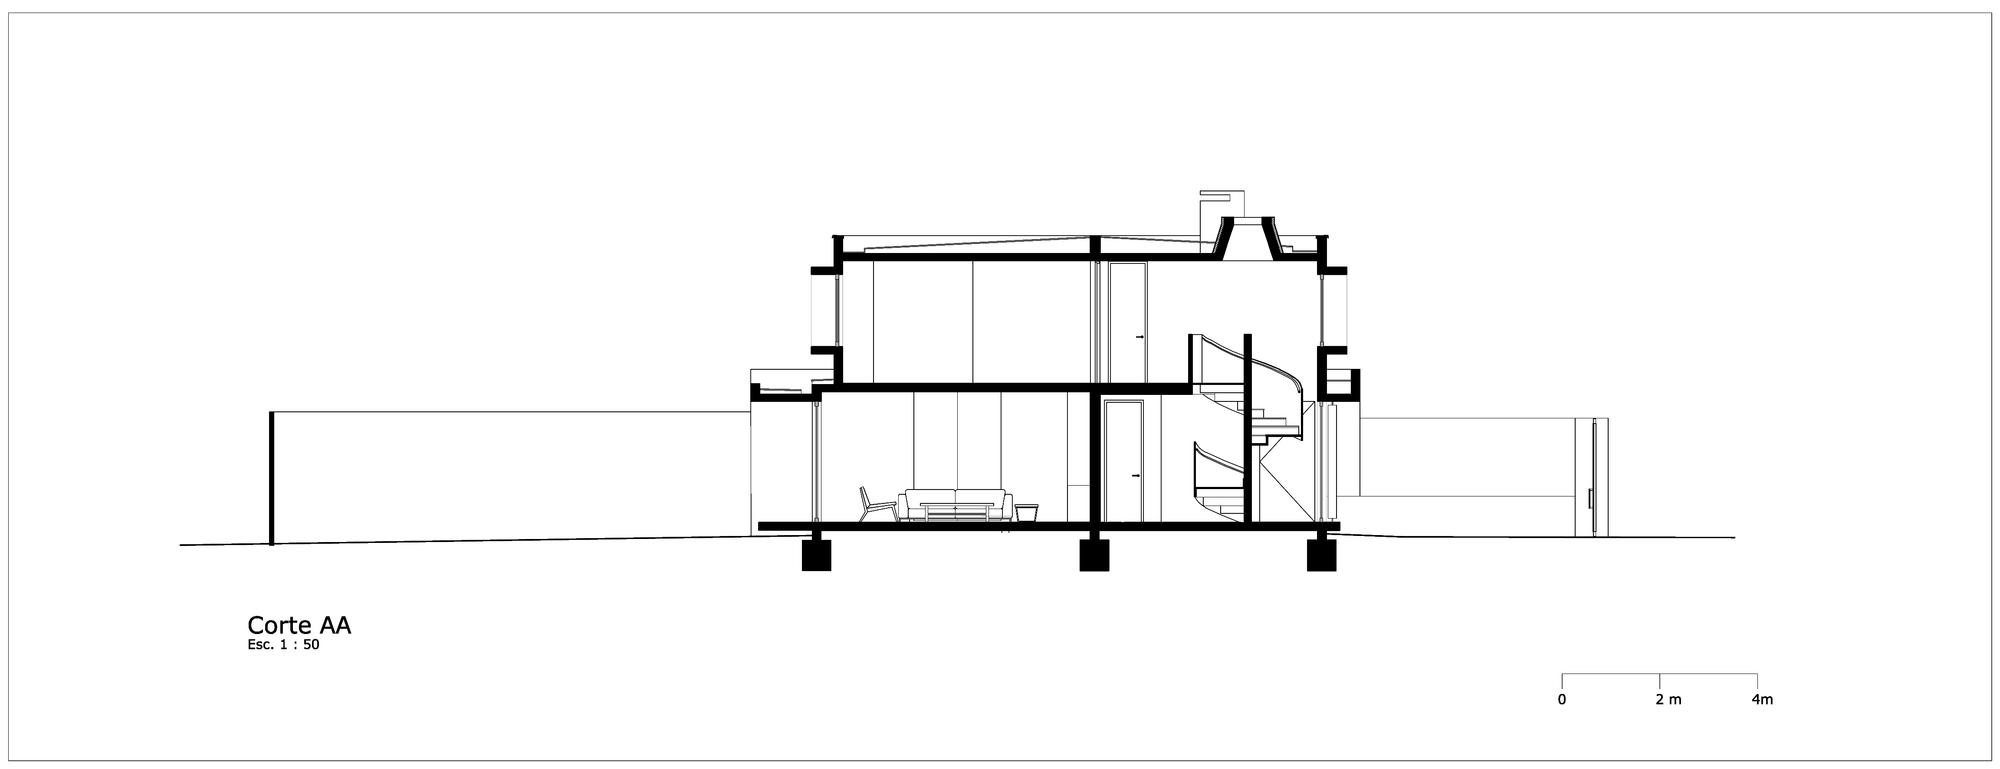 Gallery of malaga house prietoschaffer arquitectos 14 - Arquitectos interioristas malaga ...